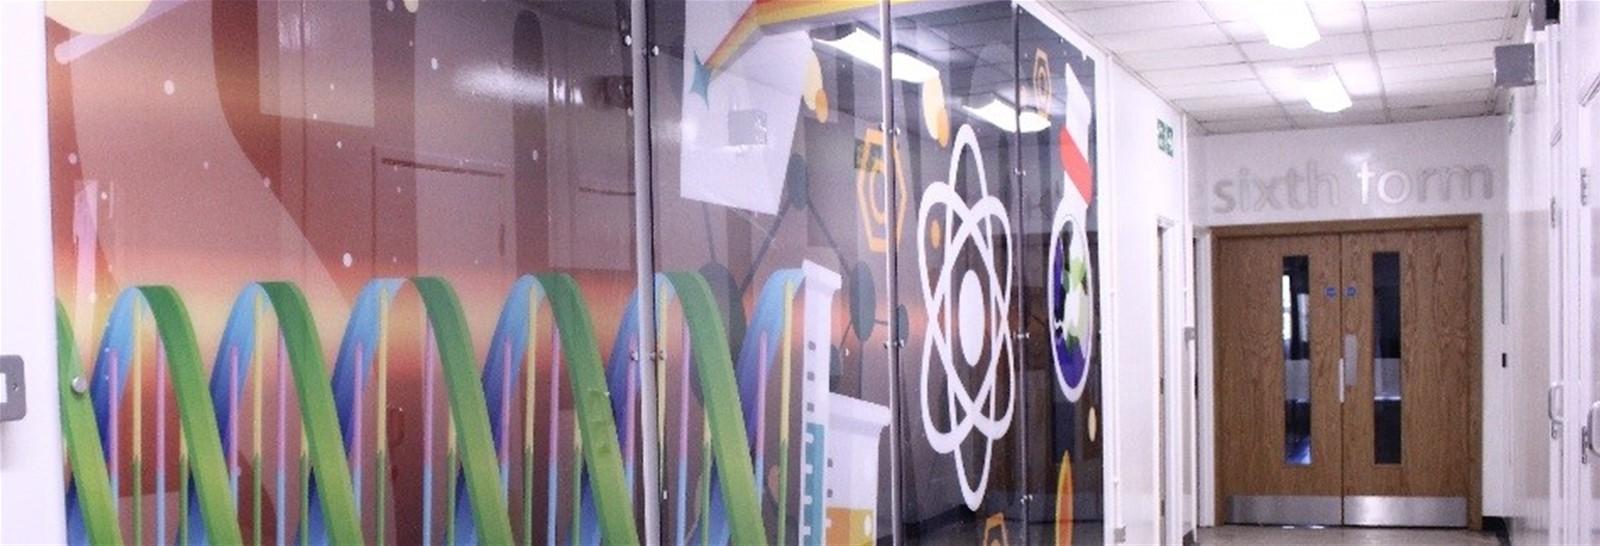 Wall panel graphics for Moor Park School